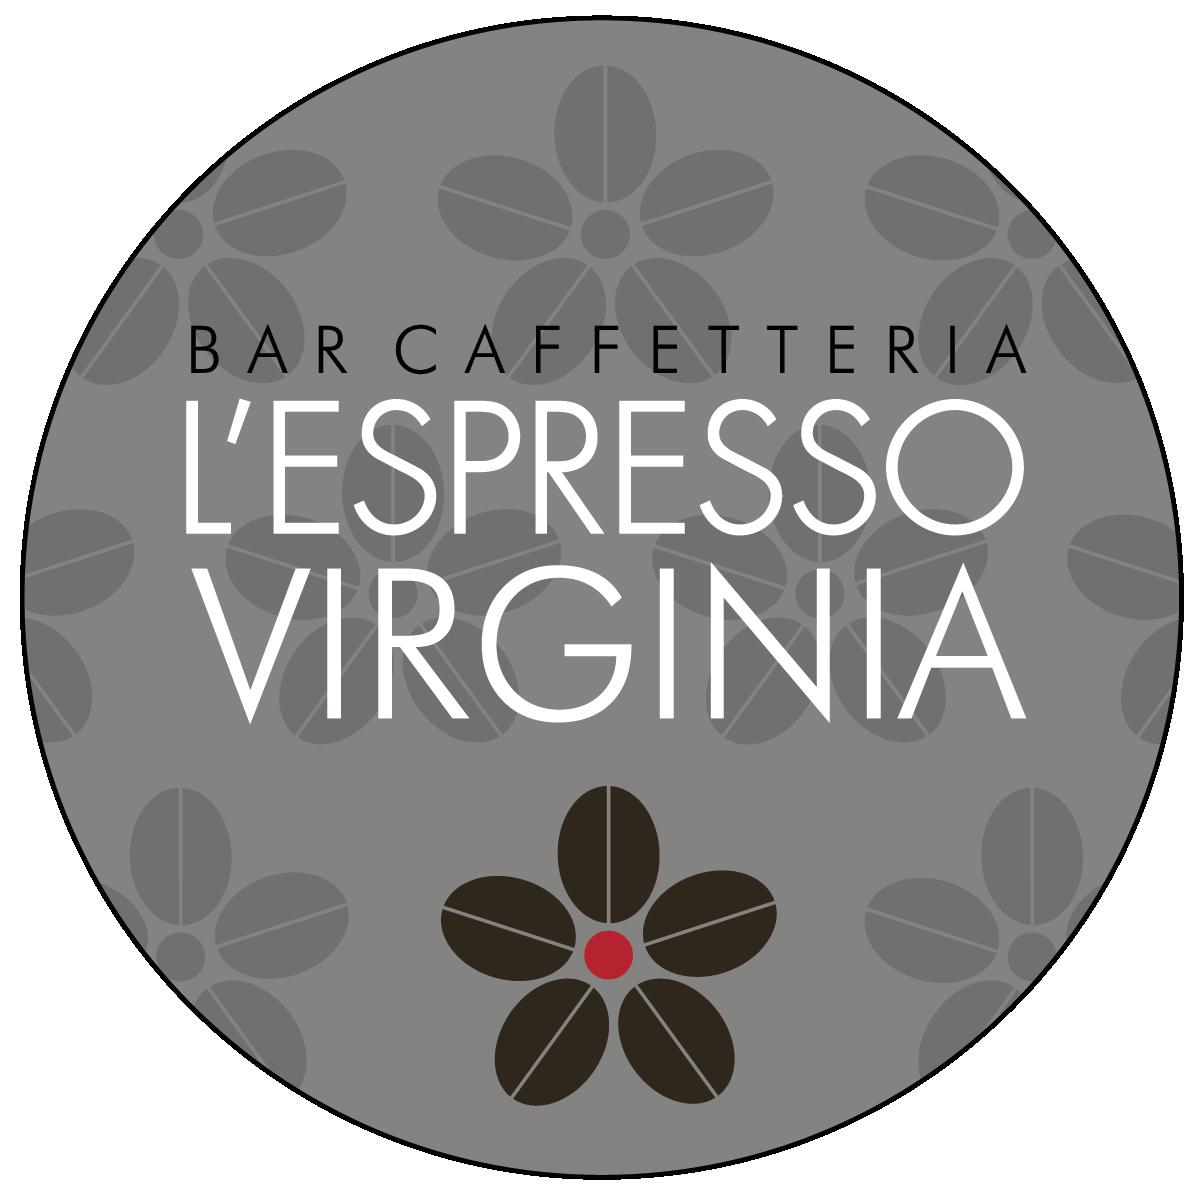 Virginia Cafeterias